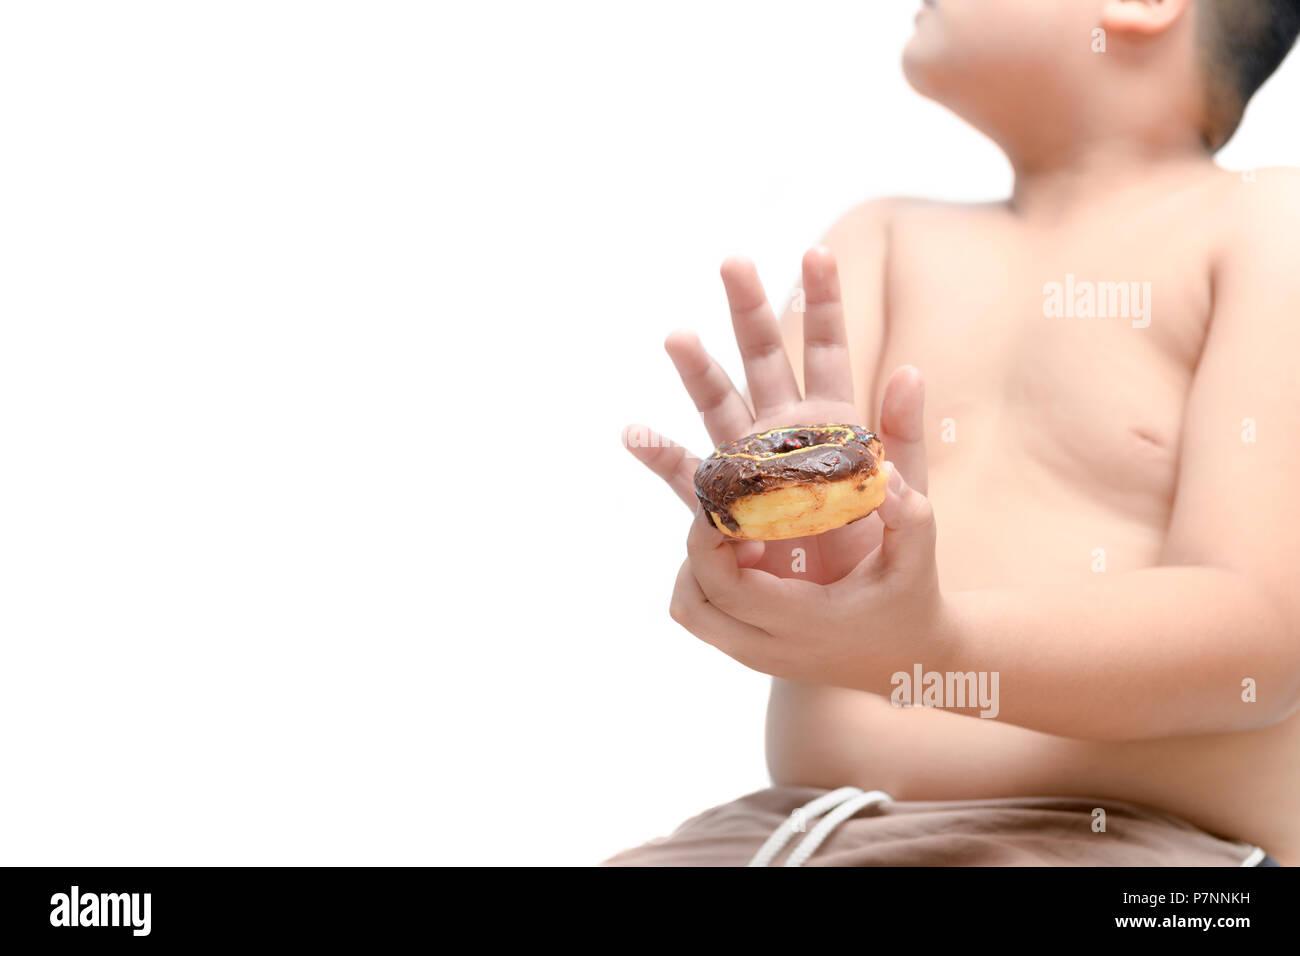 Obeso Fat Boy se niega a comer donut aislado sobre fondo blanco - adietando concepto Foto de stock